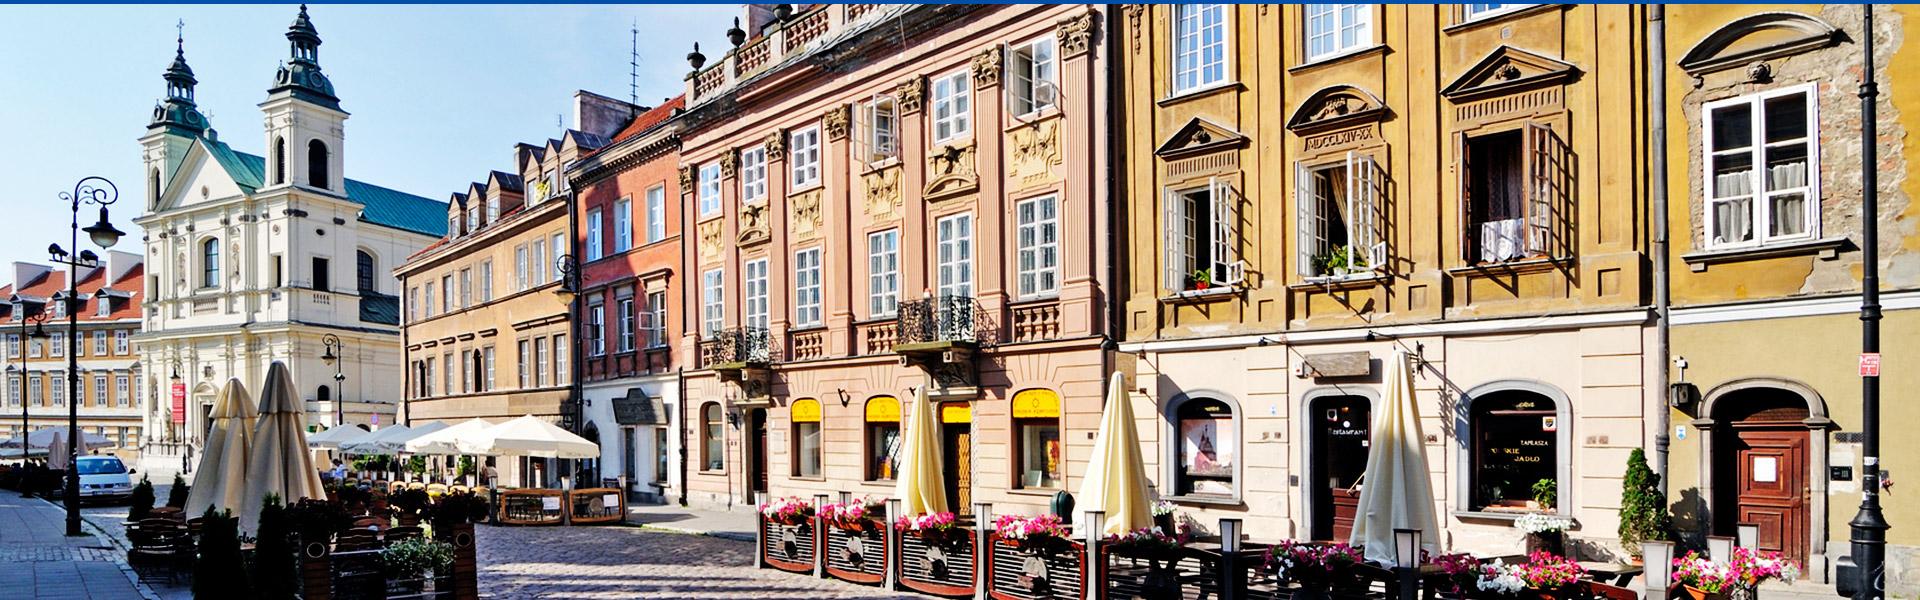 Visita Varsovia